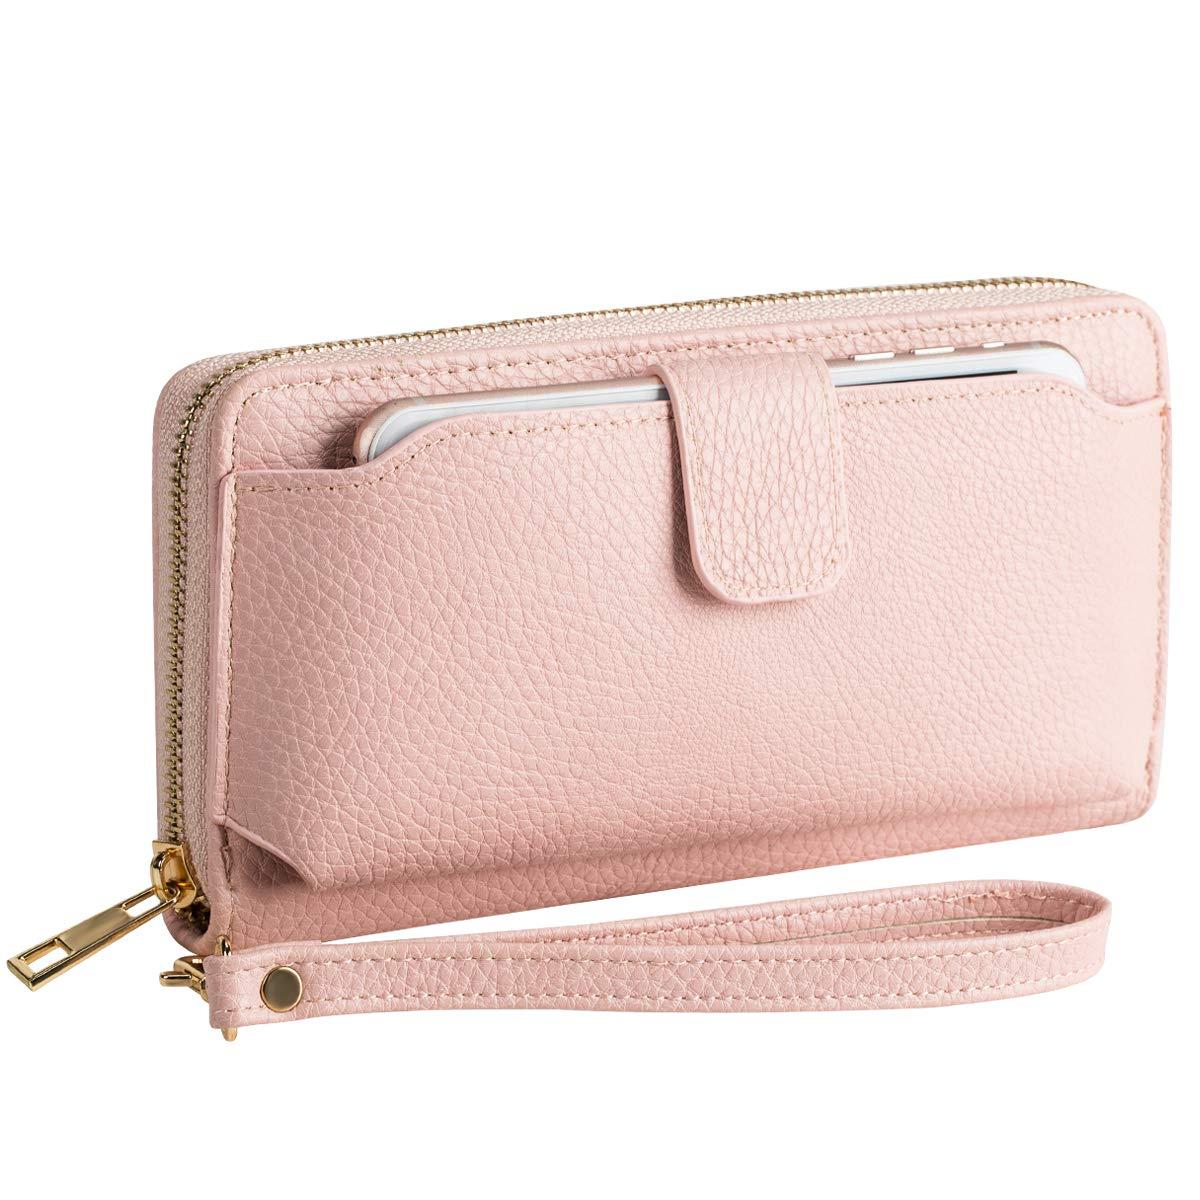 Wristlet Wallet Purses Women Cellphone Pocket Clutch by AMNF